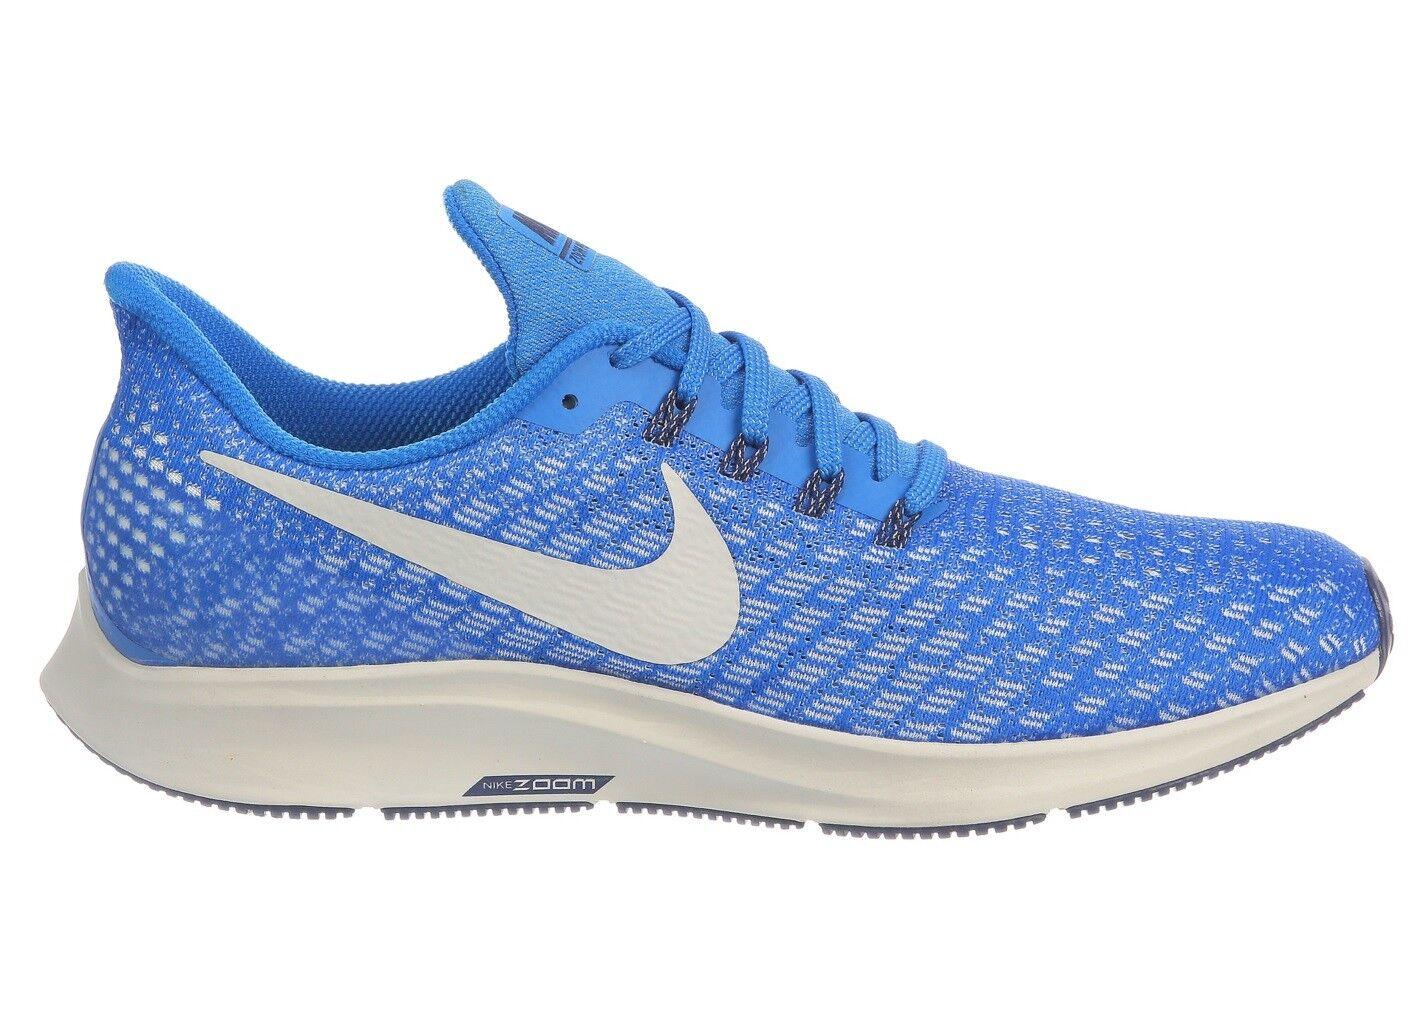 Nike cobalto air zoom pegasus 35 uomini 942851-402 cobalto Nike blaze scarpe numero 15 1490ca